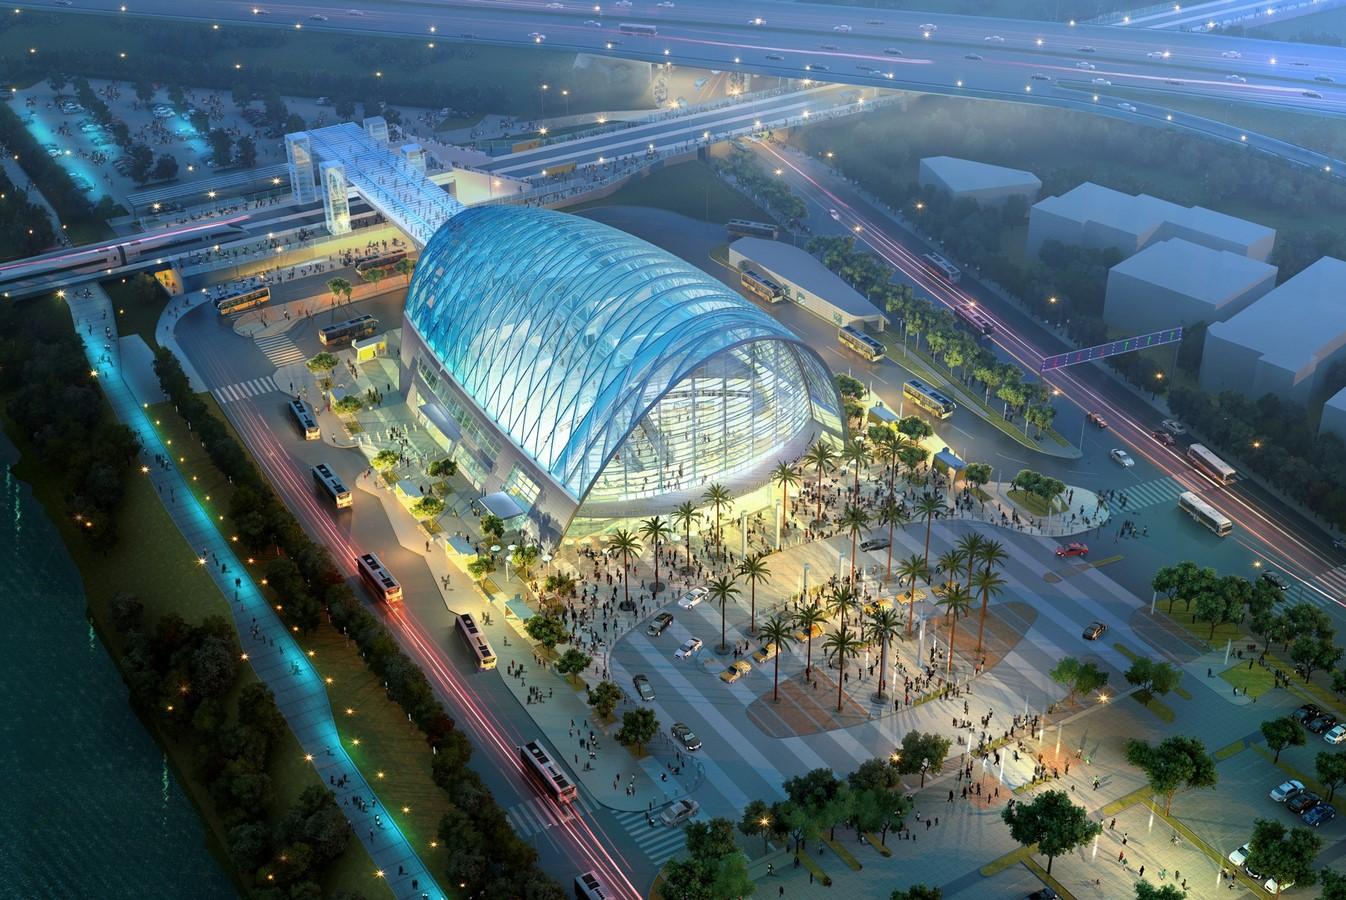 Anaheim Regional Transportation Intermodal Center (ARTIC), USA - Sheet1